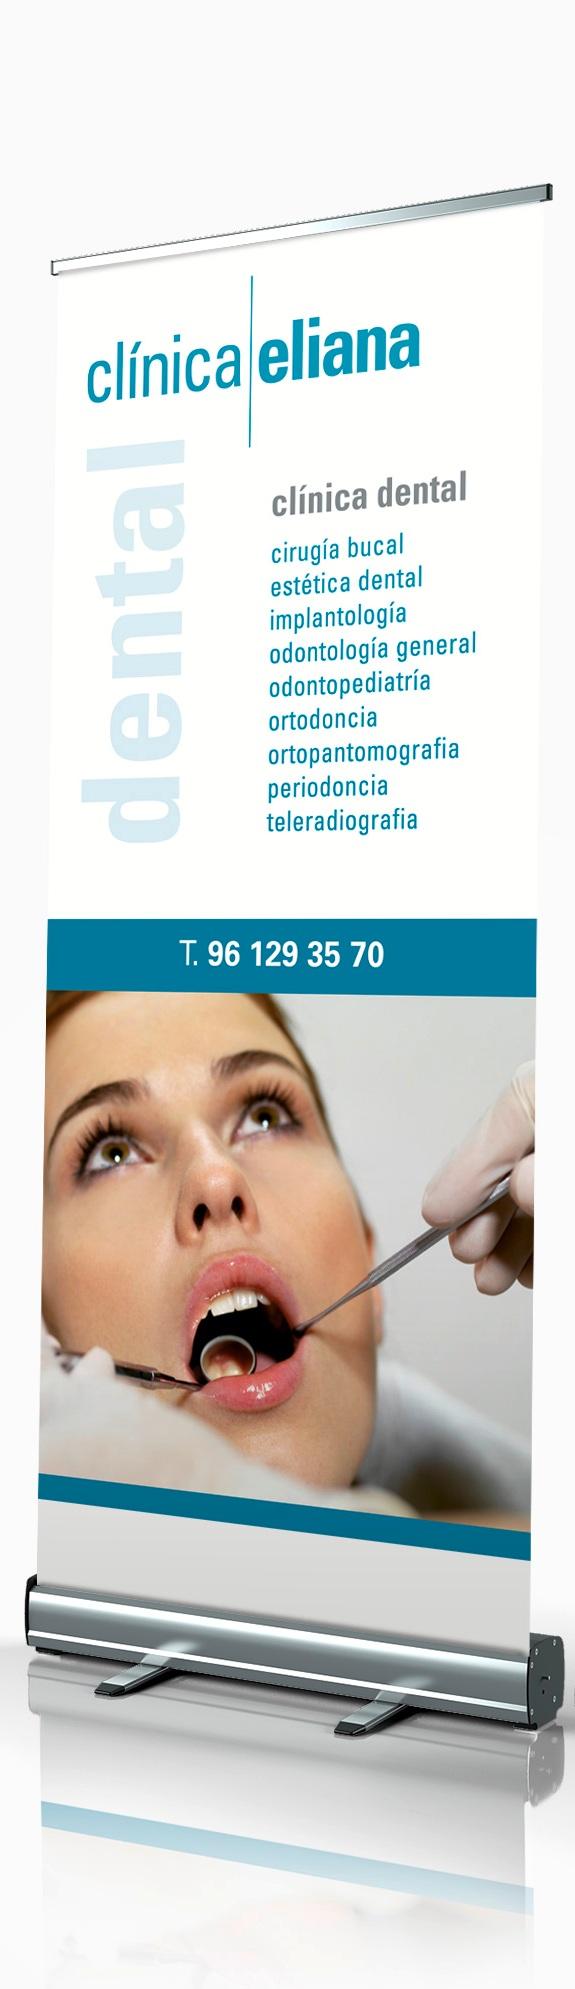 clinica eliana